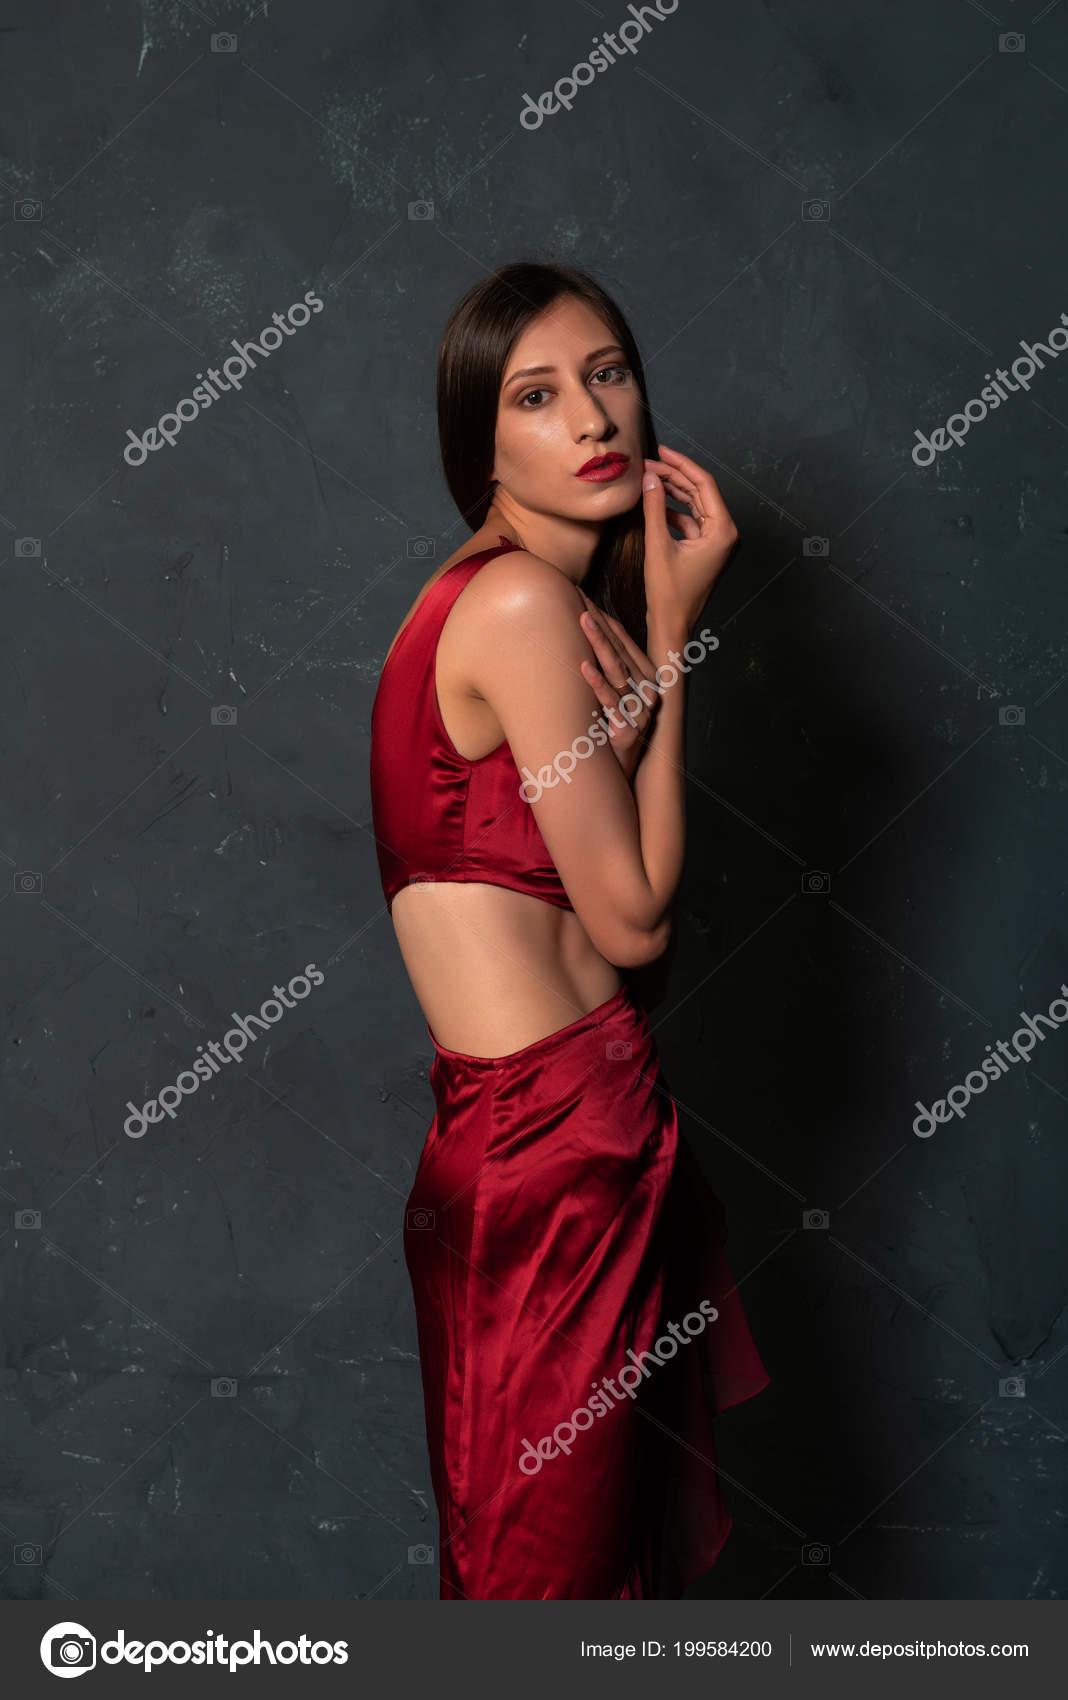 Tall Slender Ukrainian Brunette Bright Red Dress — Stock Photo ... 0361d049a